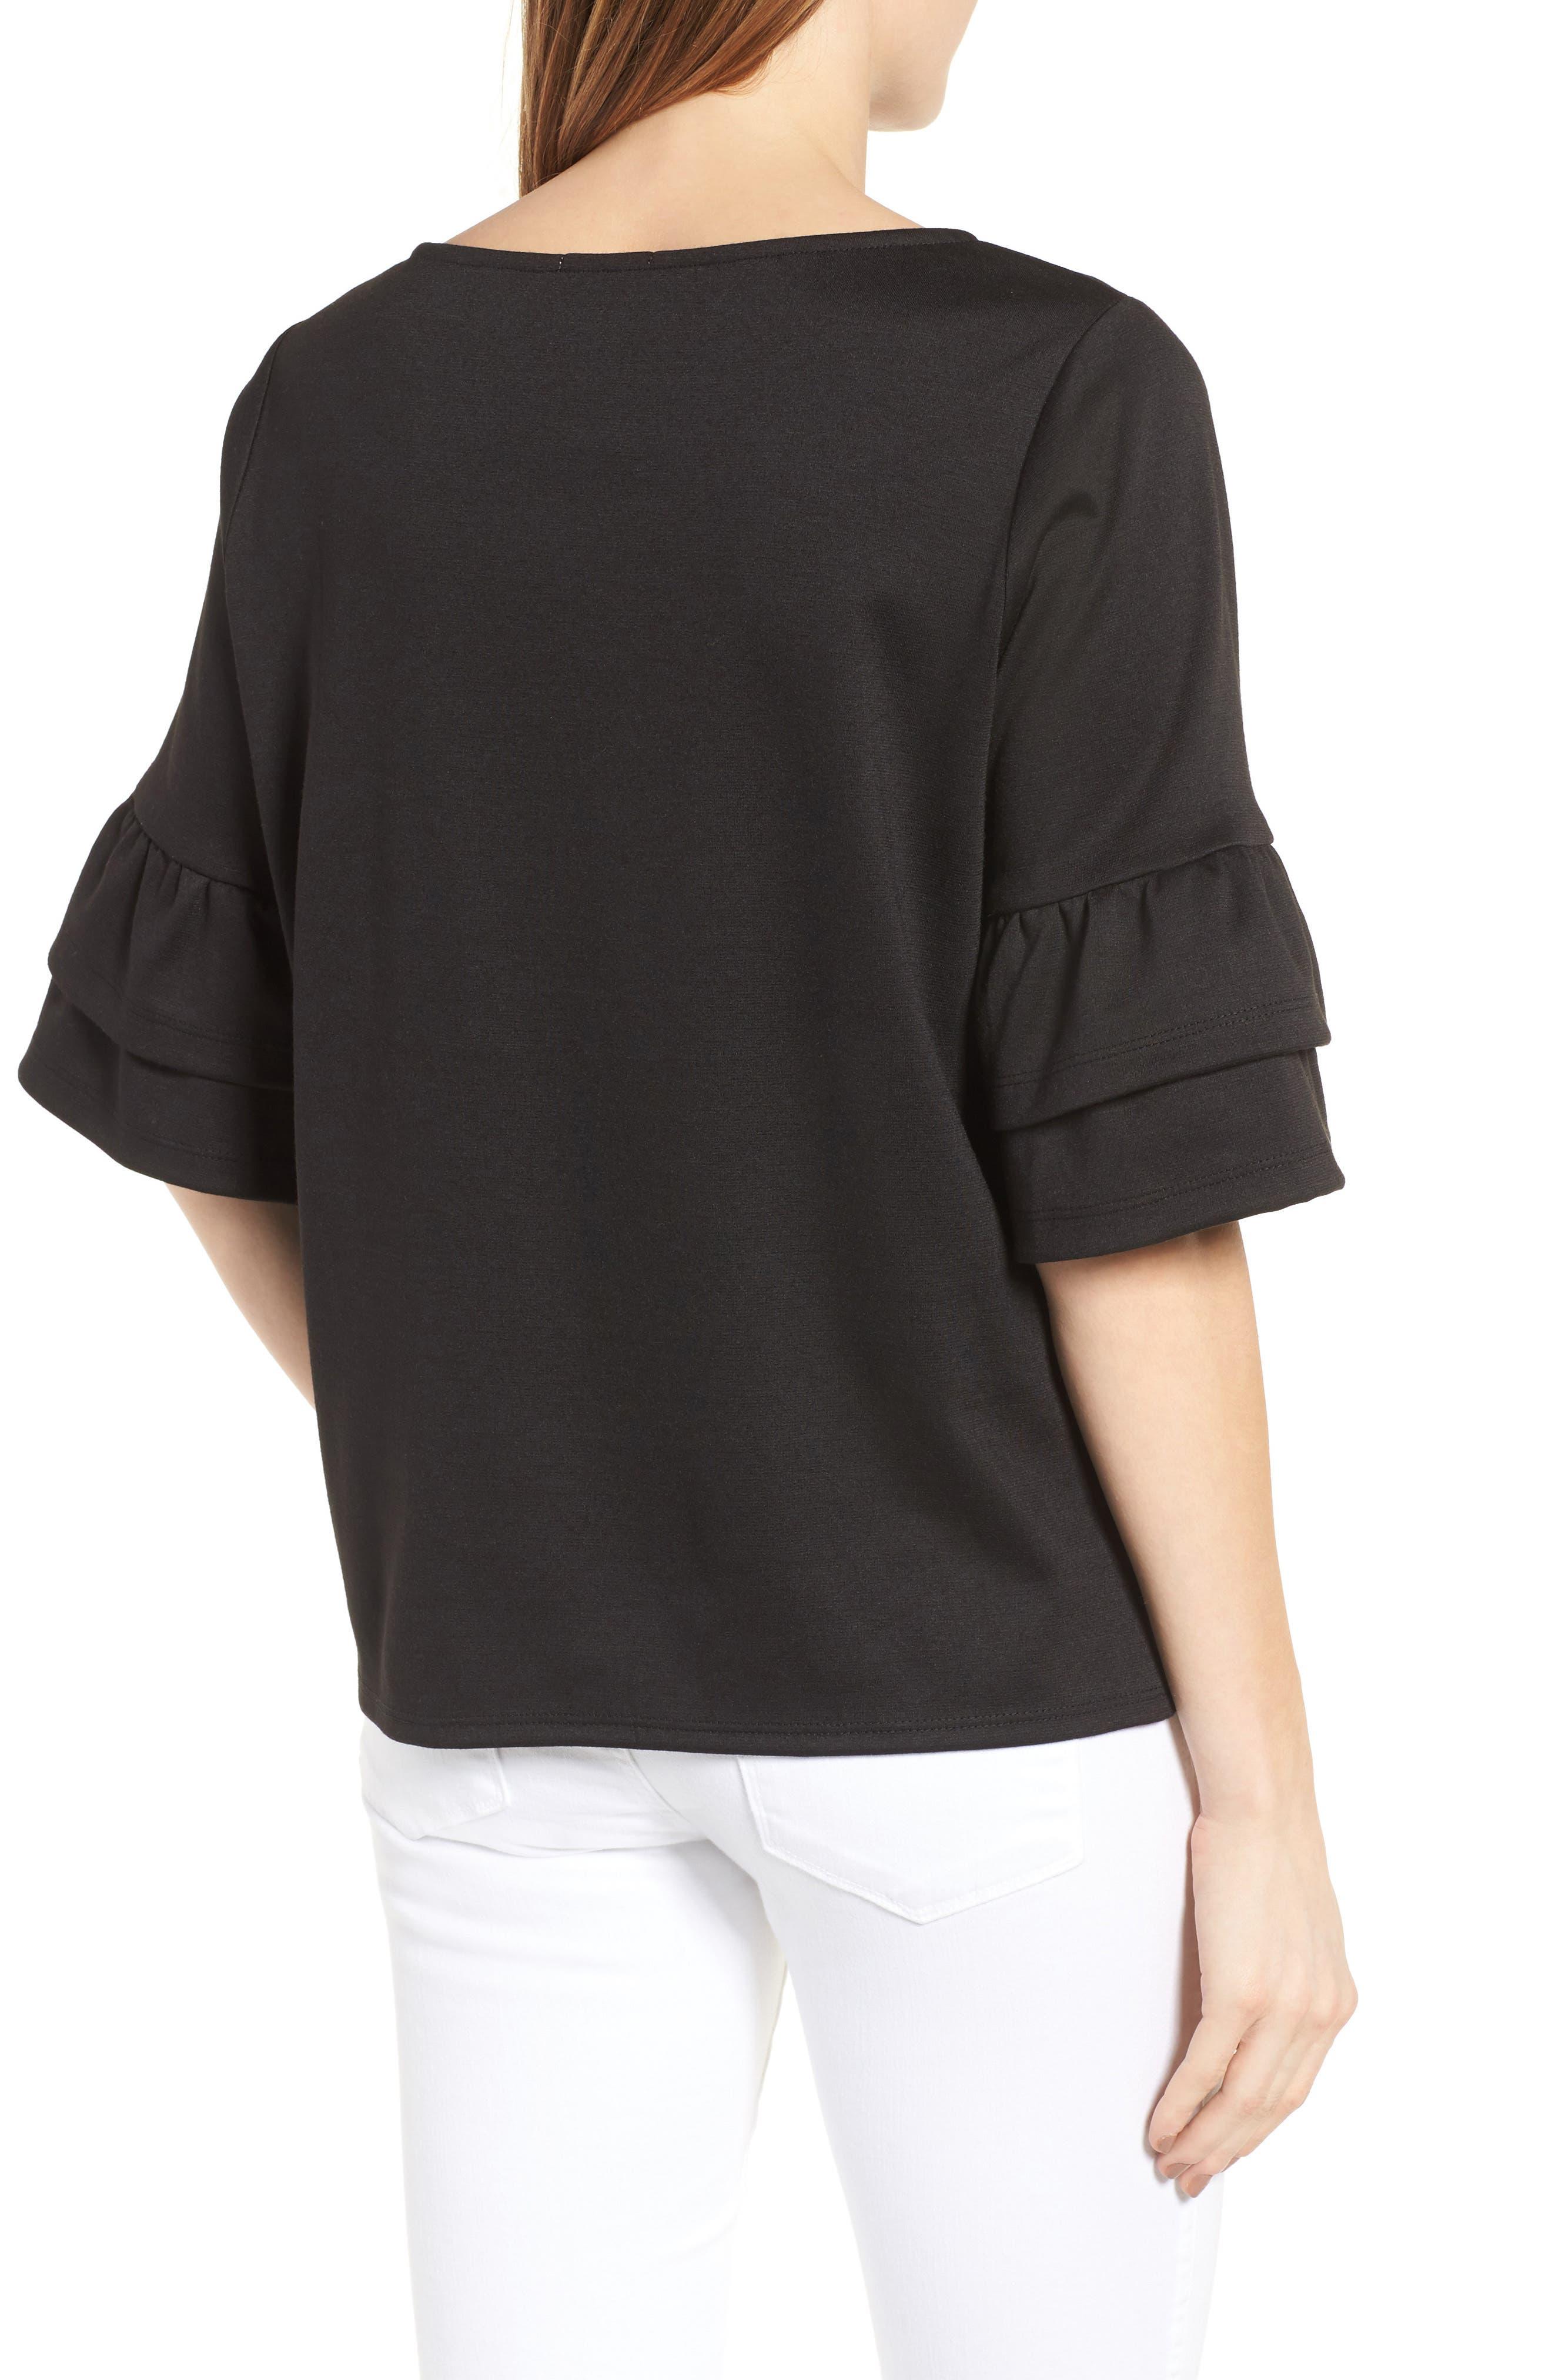 Alternate Image 2  - Halogen® Ruffle Sleeve Top (Regular & Petite)